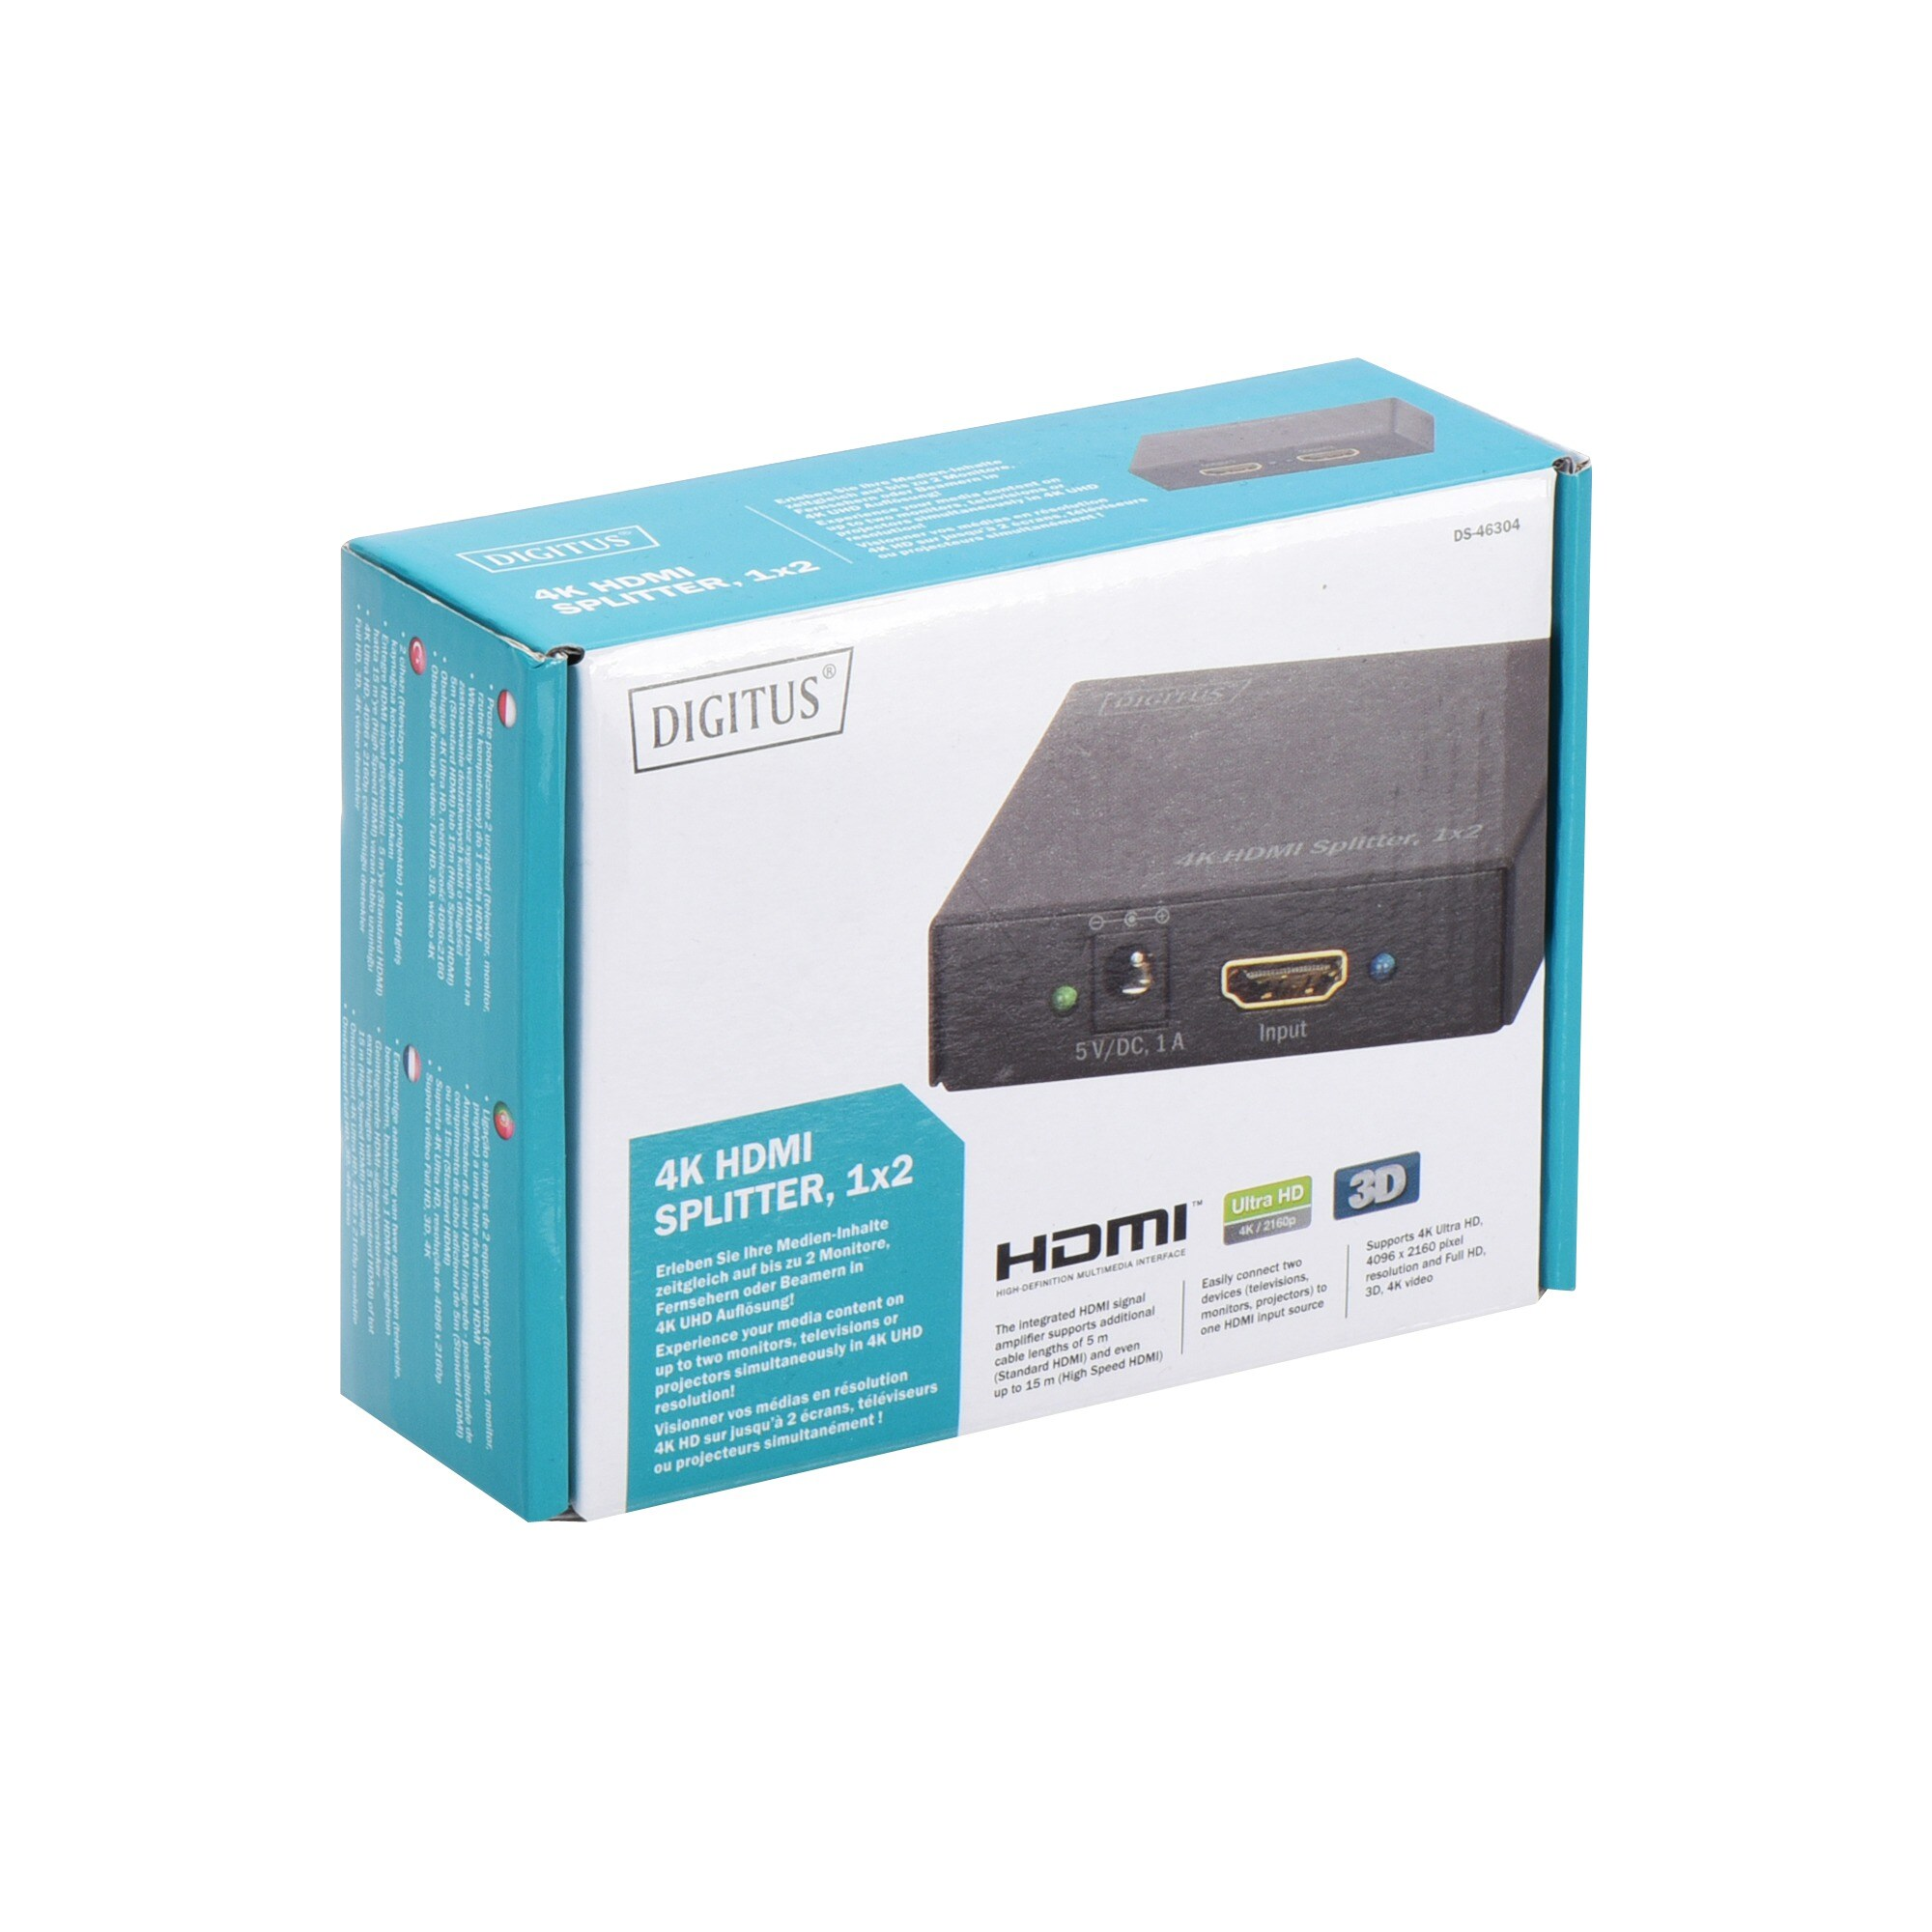 Digitus Splitter & Switches HDMI Splitter 4K UHD 1x HDMI > 2x HDMI